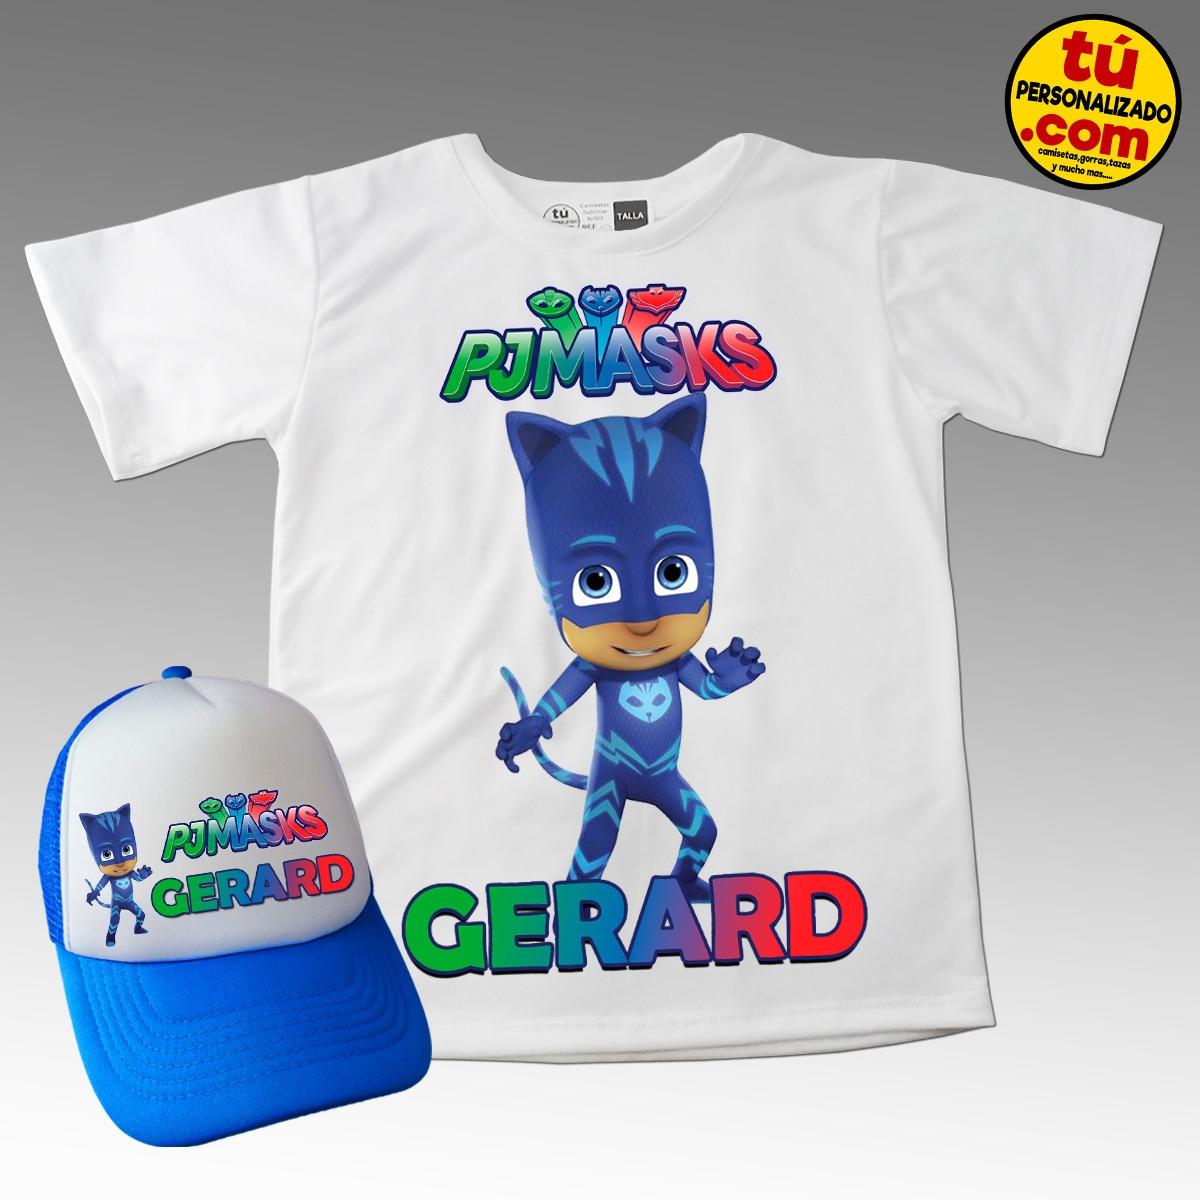 63f72df614a79 Camiseta Mas Gorra Combo Heroes En Pijamas Niños Algodon -   35.000 ...